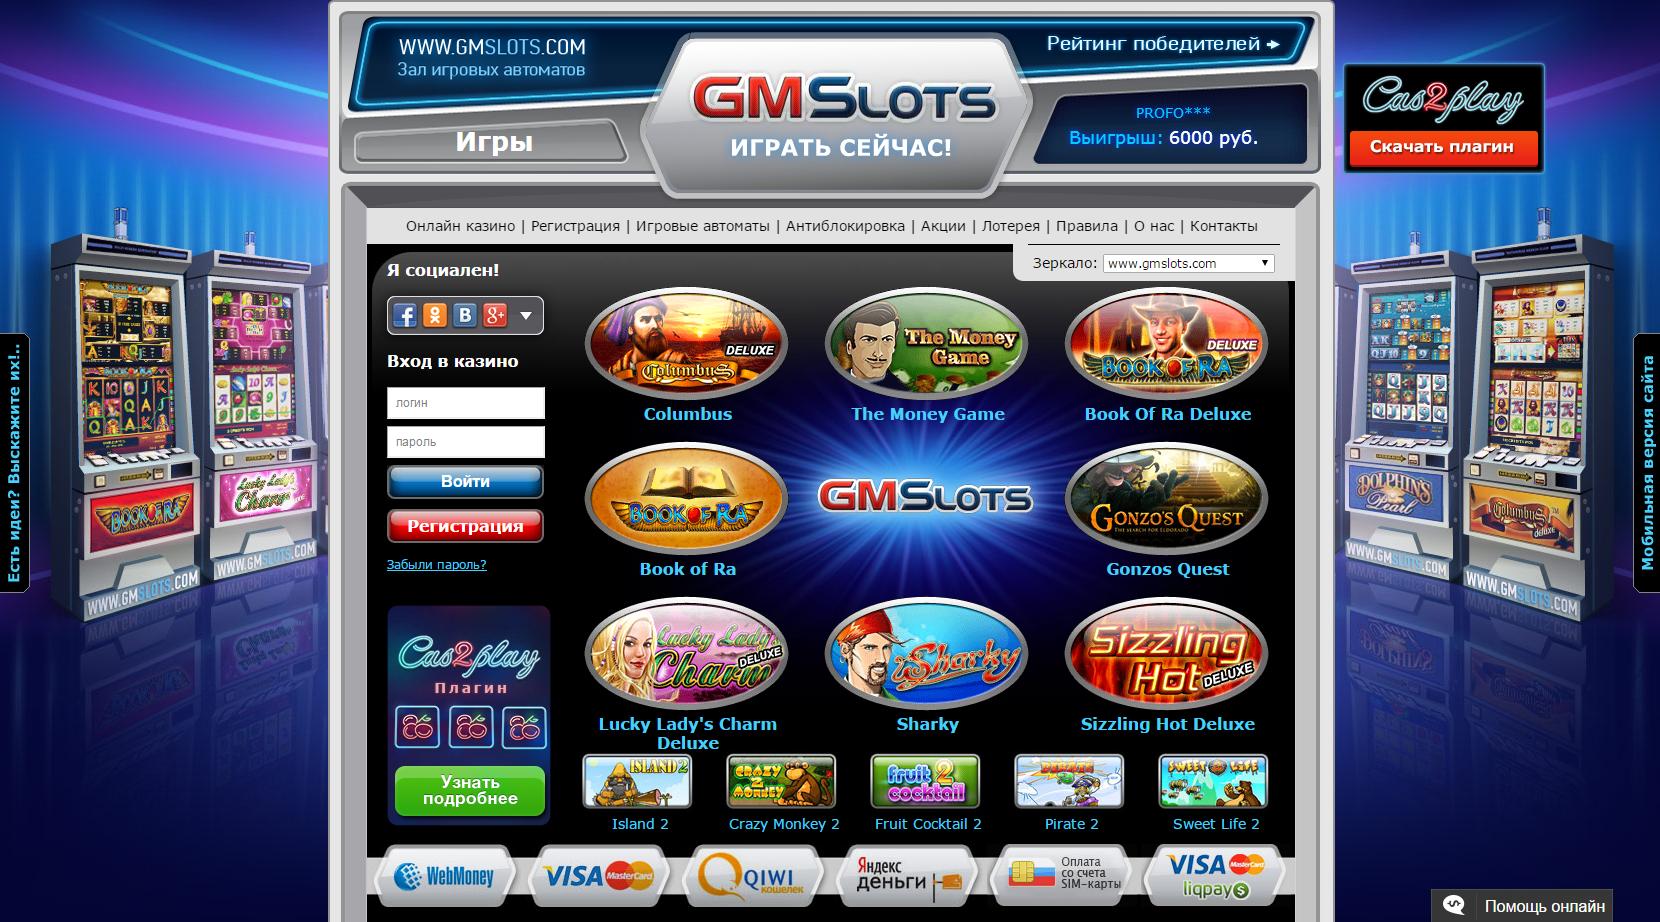 Онлайн казино гаминаторслотс ва банк казино город томск